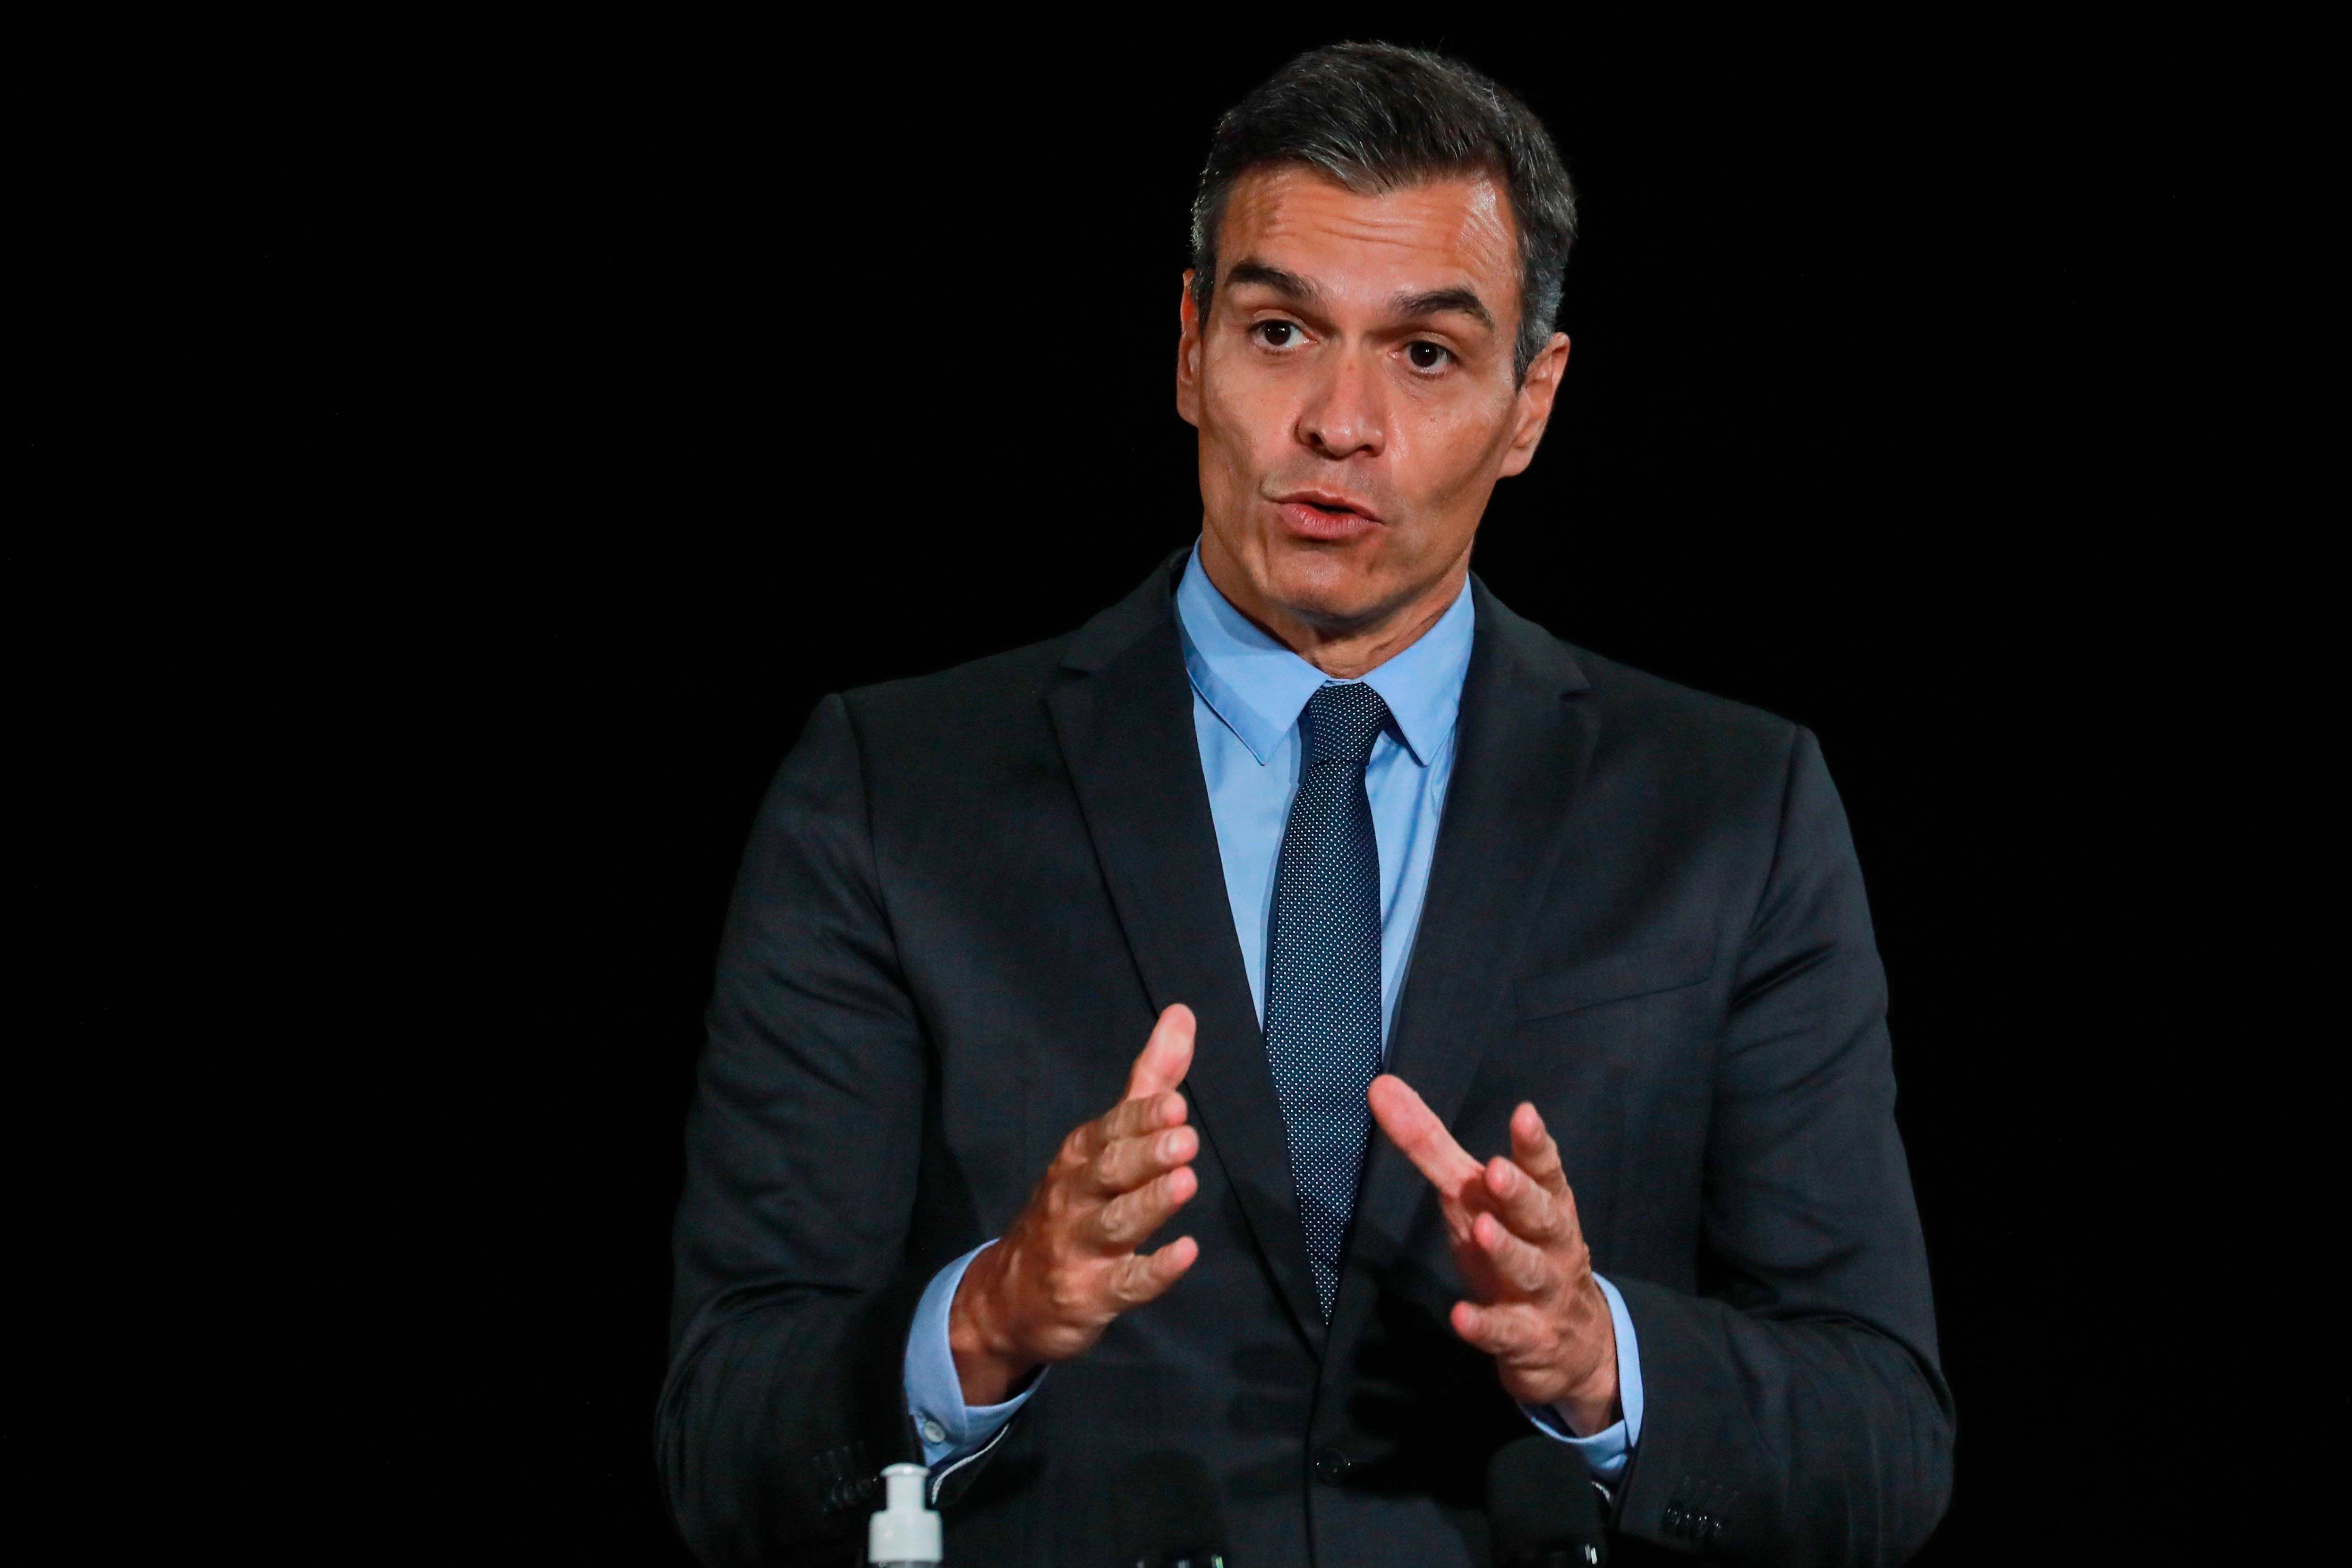 El presidente de España, Pedro Sánchez (EFE/EPA/LUDOVIC MARIN / POOL MAXPPP OUT)